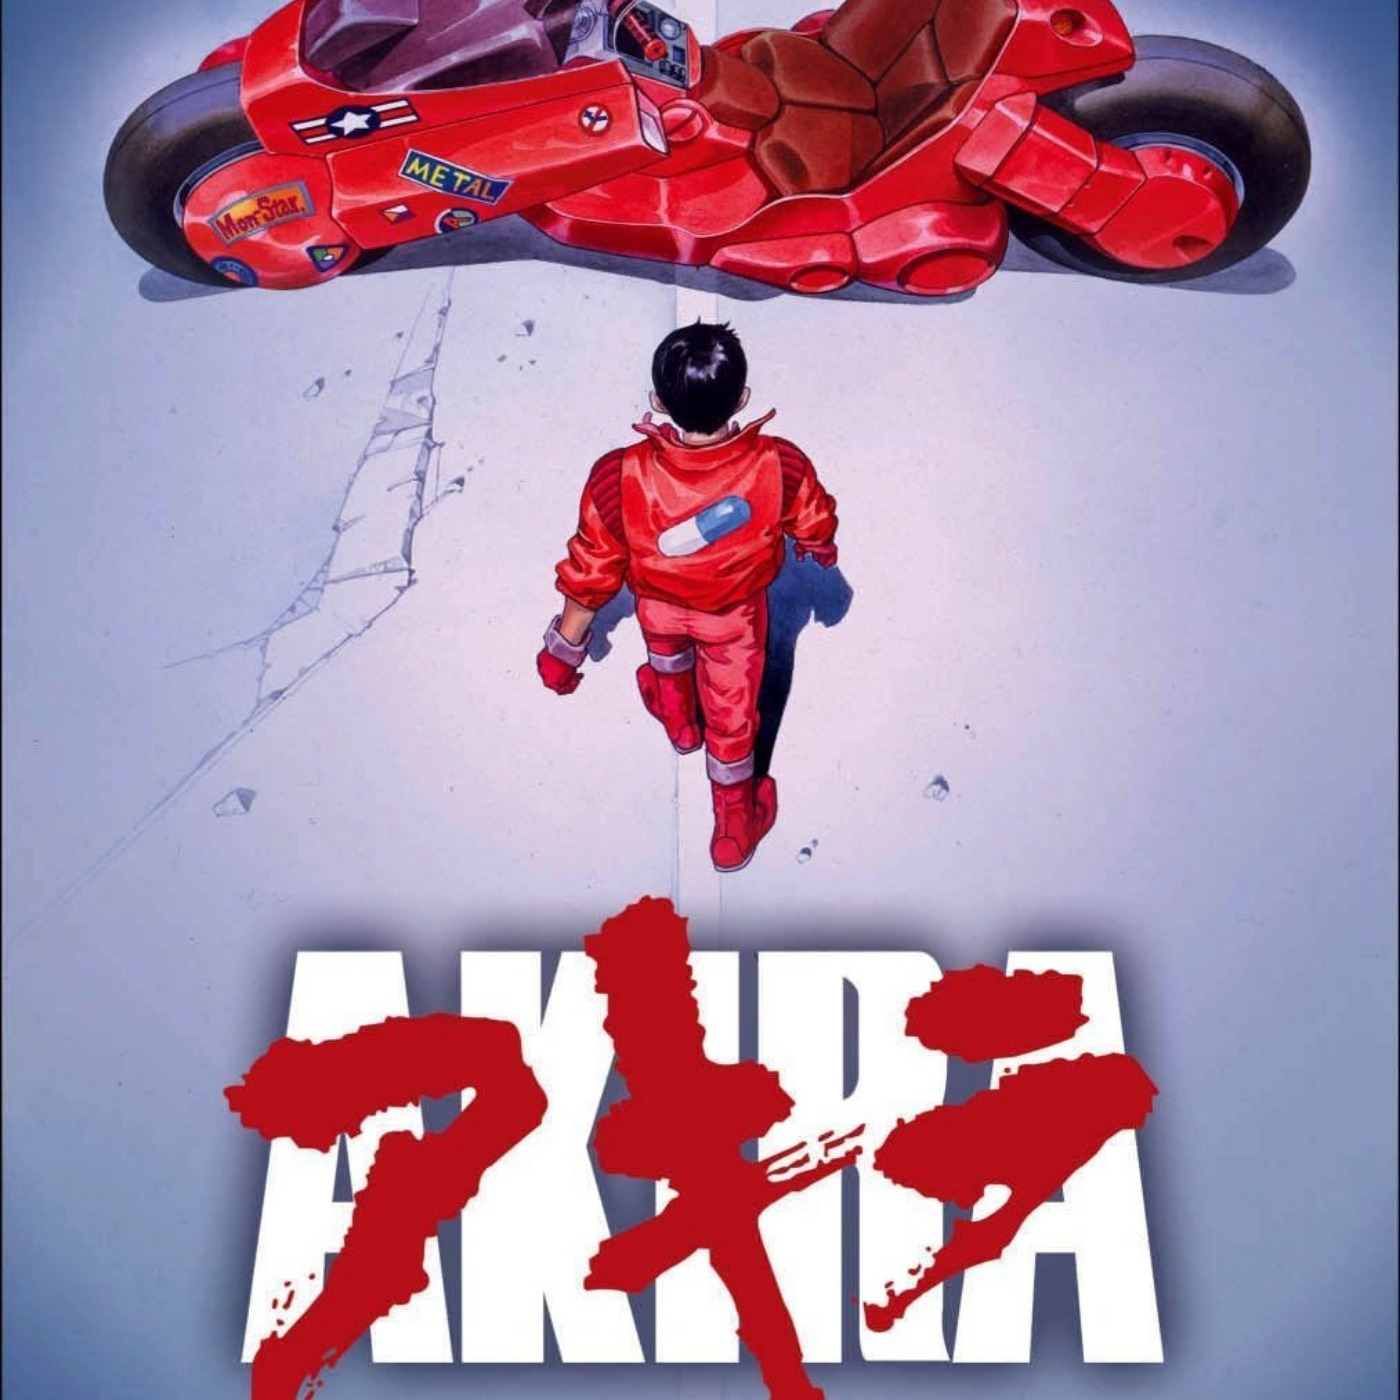 PODCAST CINEMA | CRITIQUE DU FILM Akira